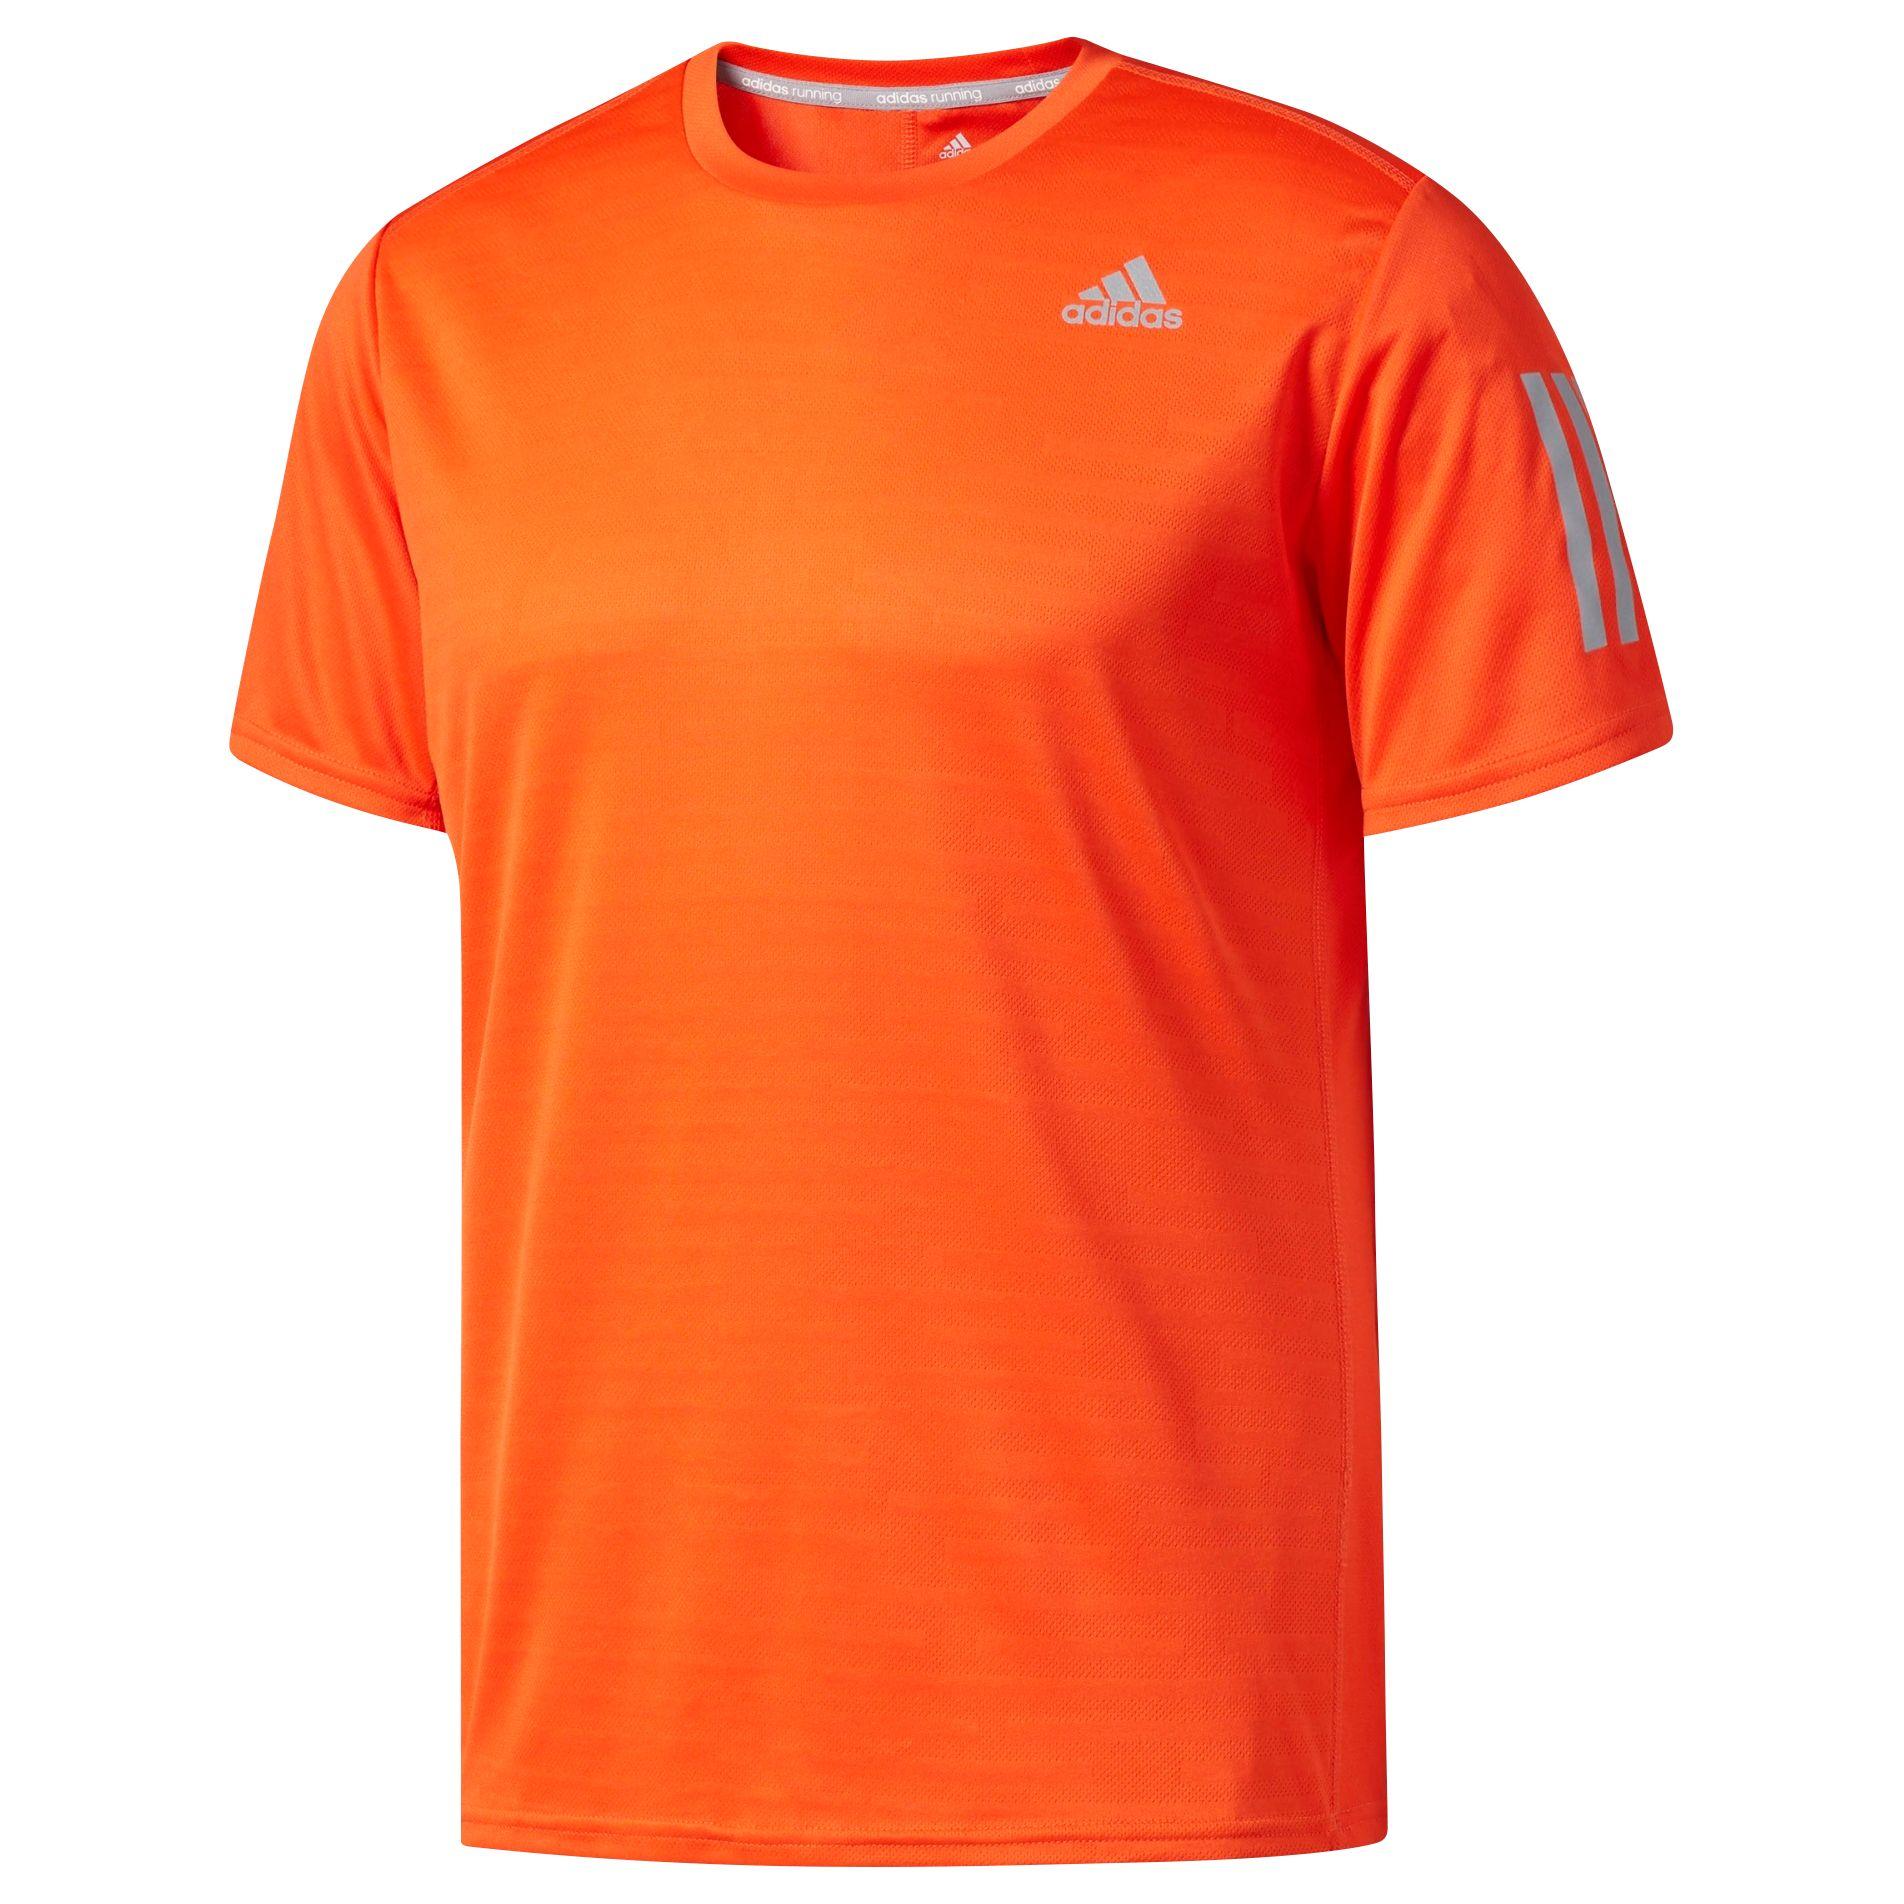 Response Short Neck ShirtOrange Adidas Sleeve T Crew Running At SzpMVqUG